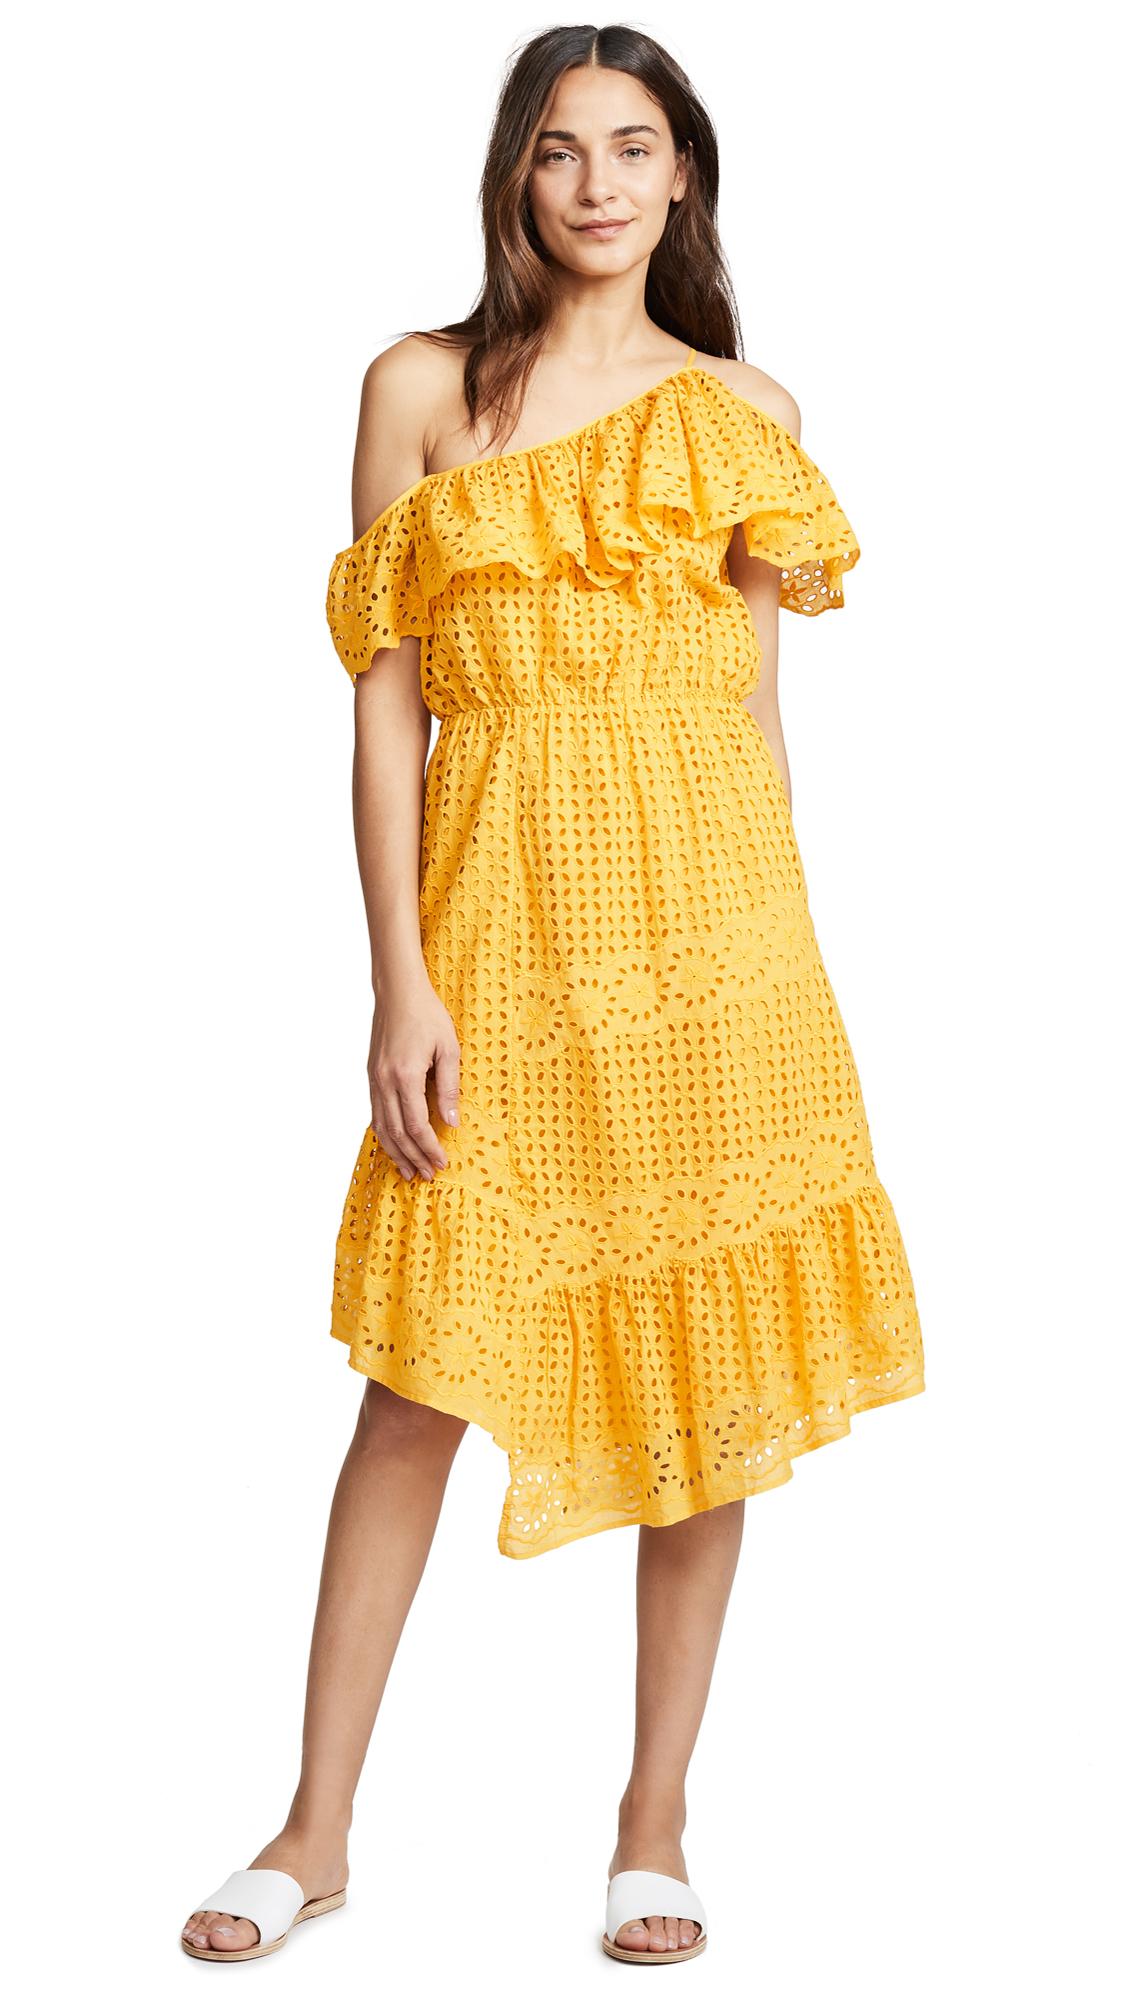 Joie Corynn Dress In Cornsilk